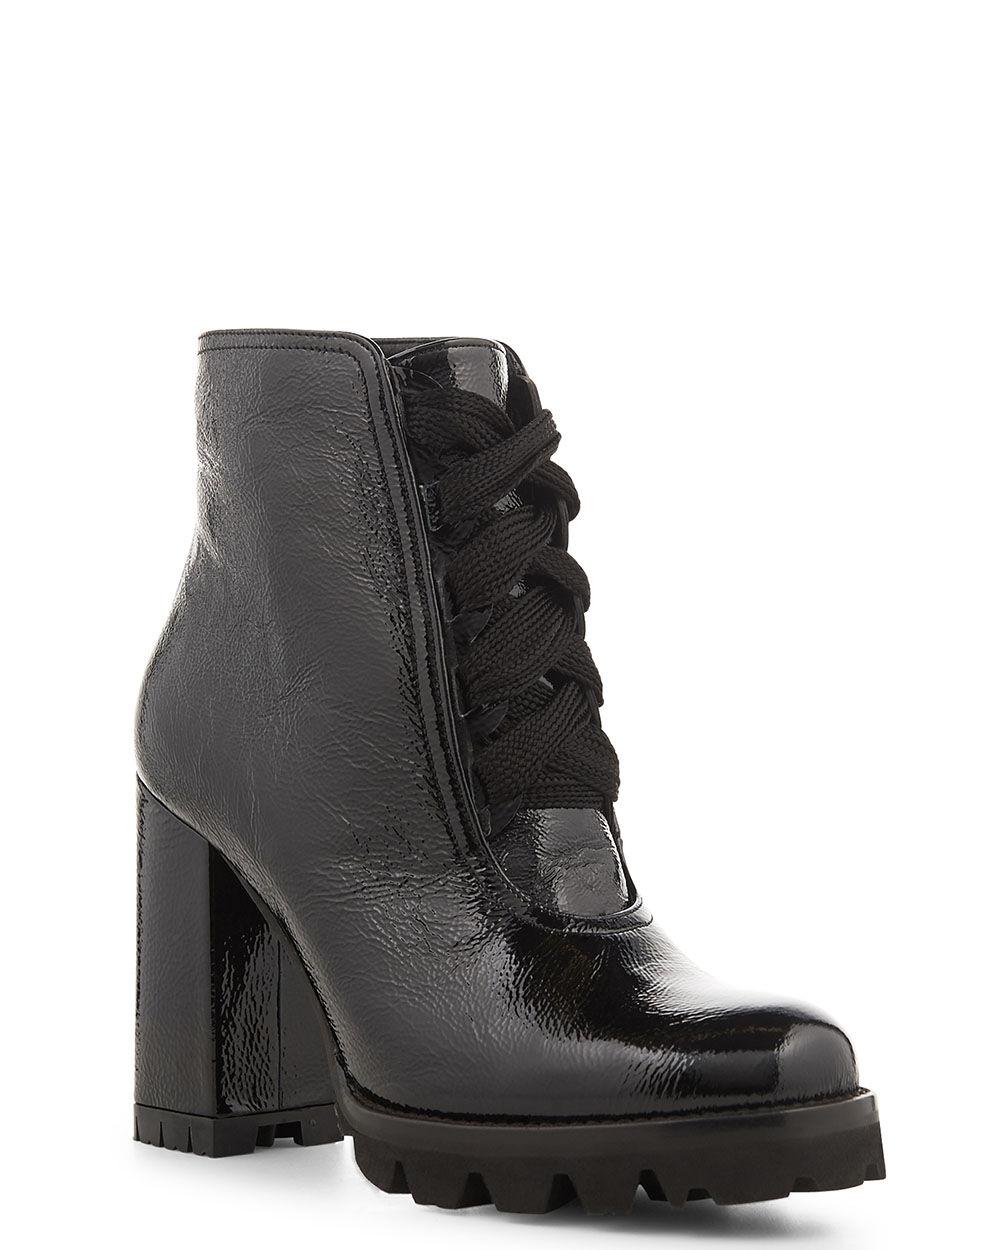 boots guillia mode femme